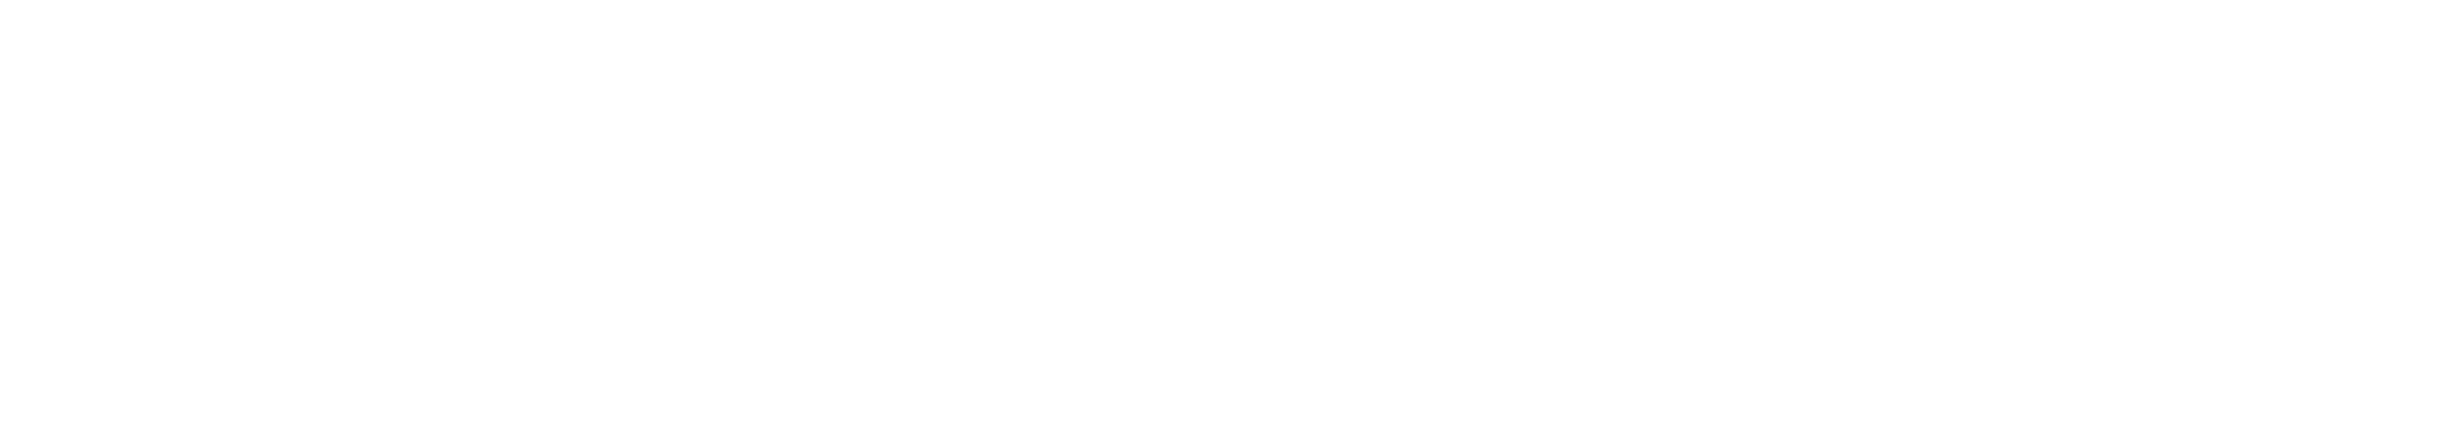 sailing-black-book-logo